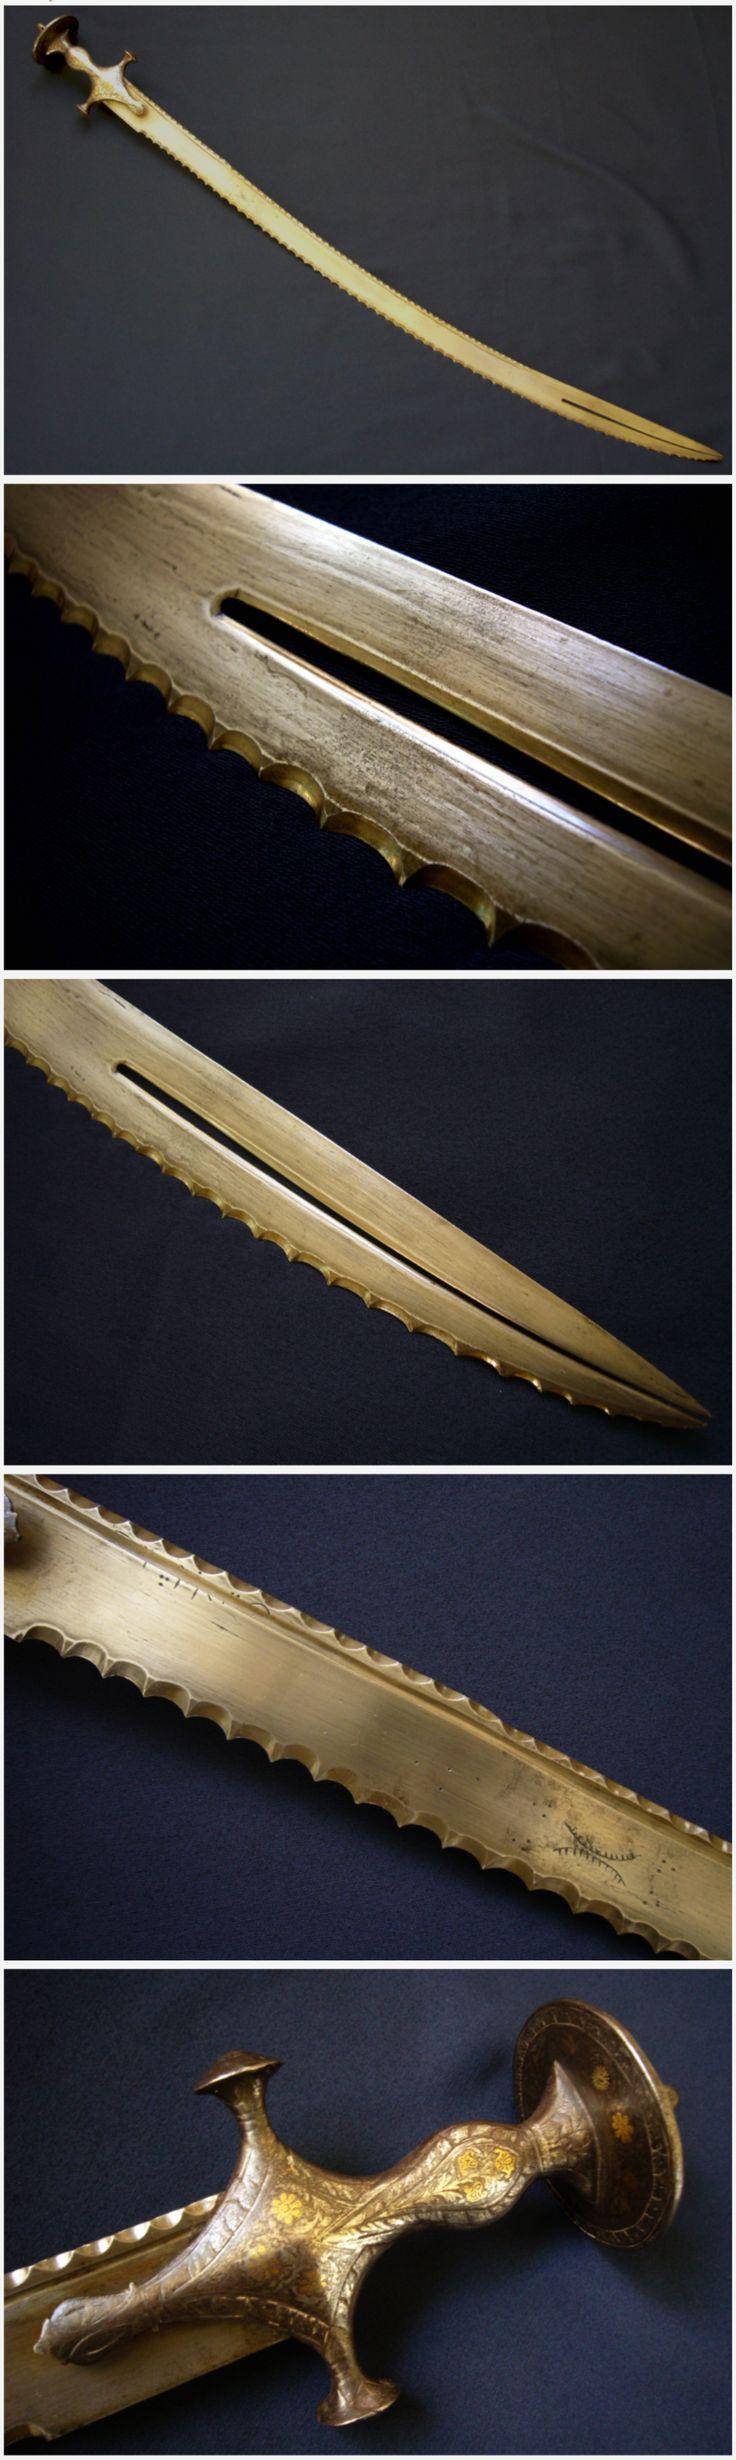 Indian zulfikar / zulfiqar (split tip) sword with serrated blade and tulwar hilt.